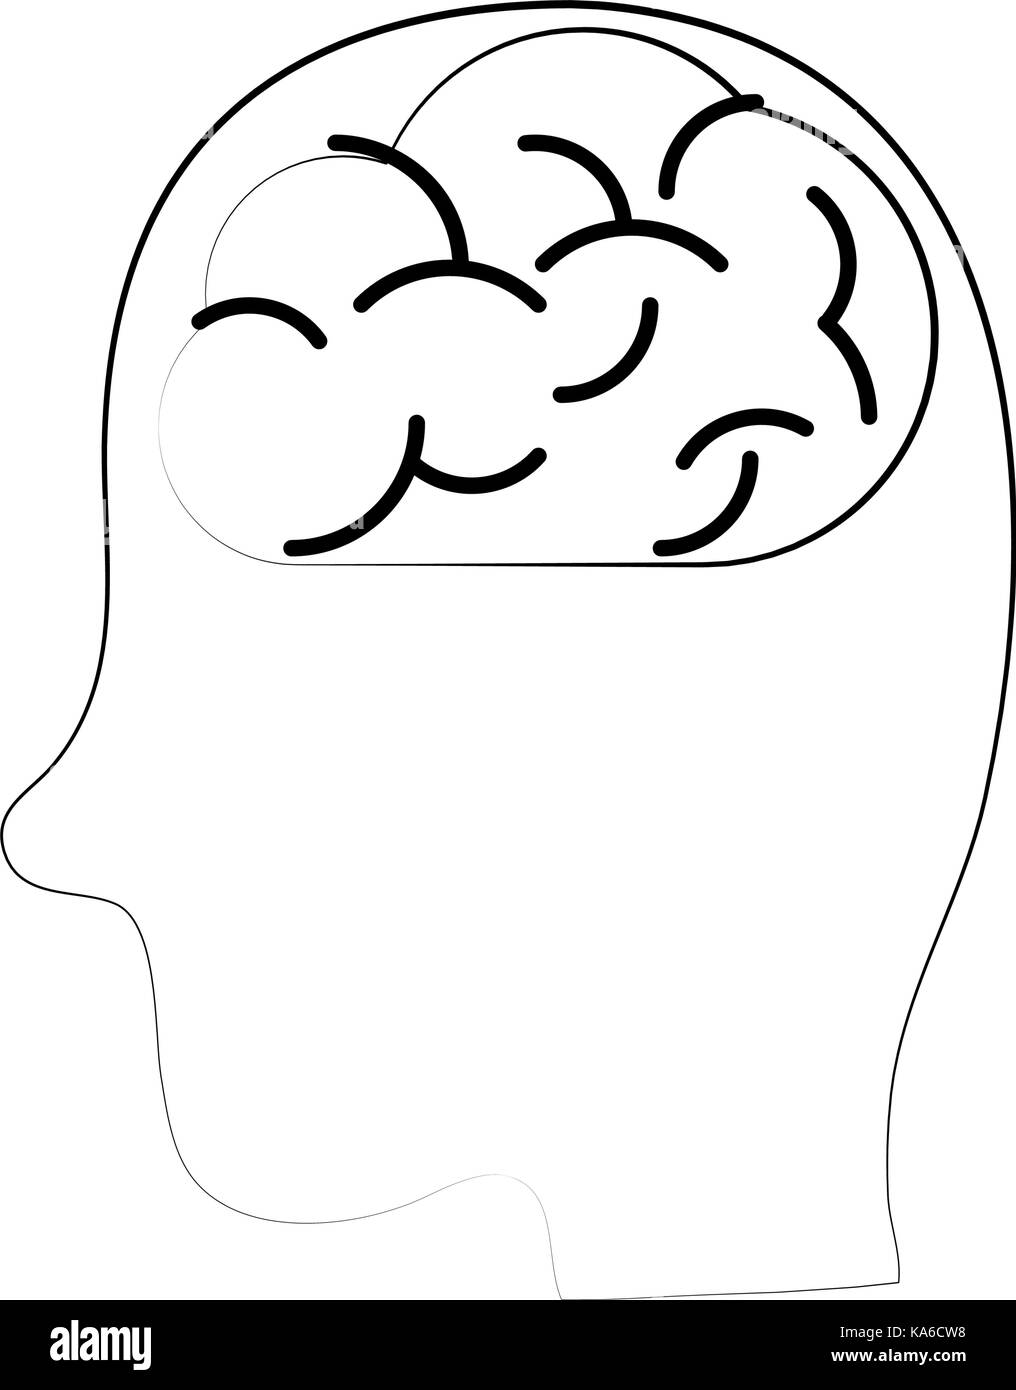 medical human brain - Stock Image